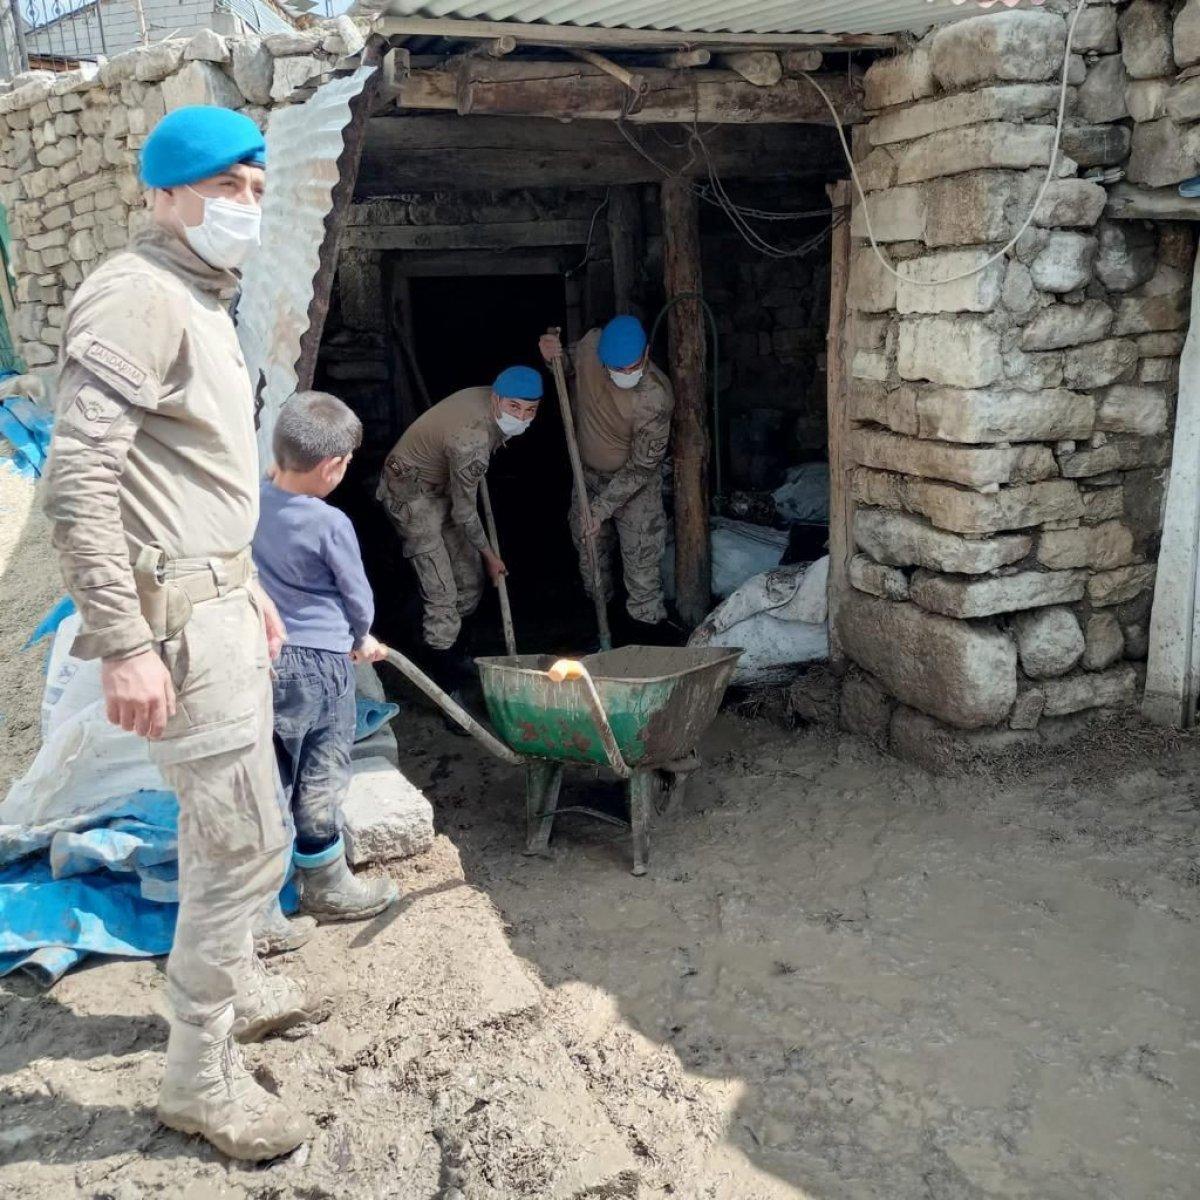 Kars'ta, jandarma ve komandolar sel bölgesinde  #4